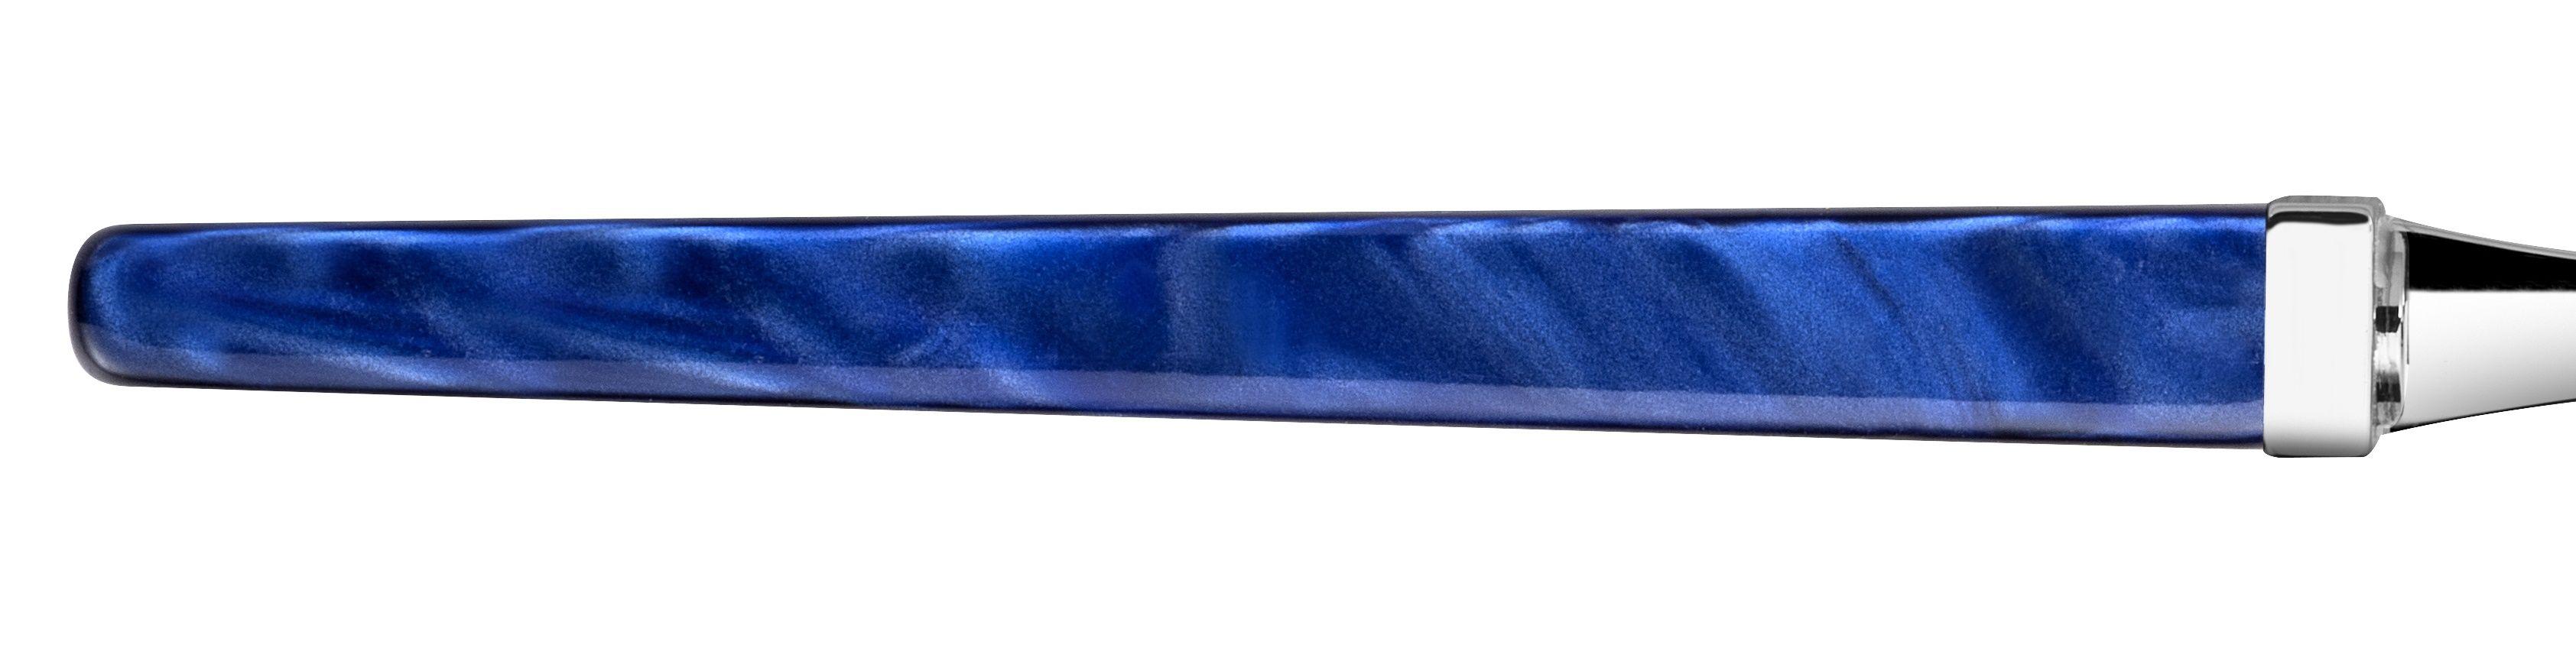 51-night blue